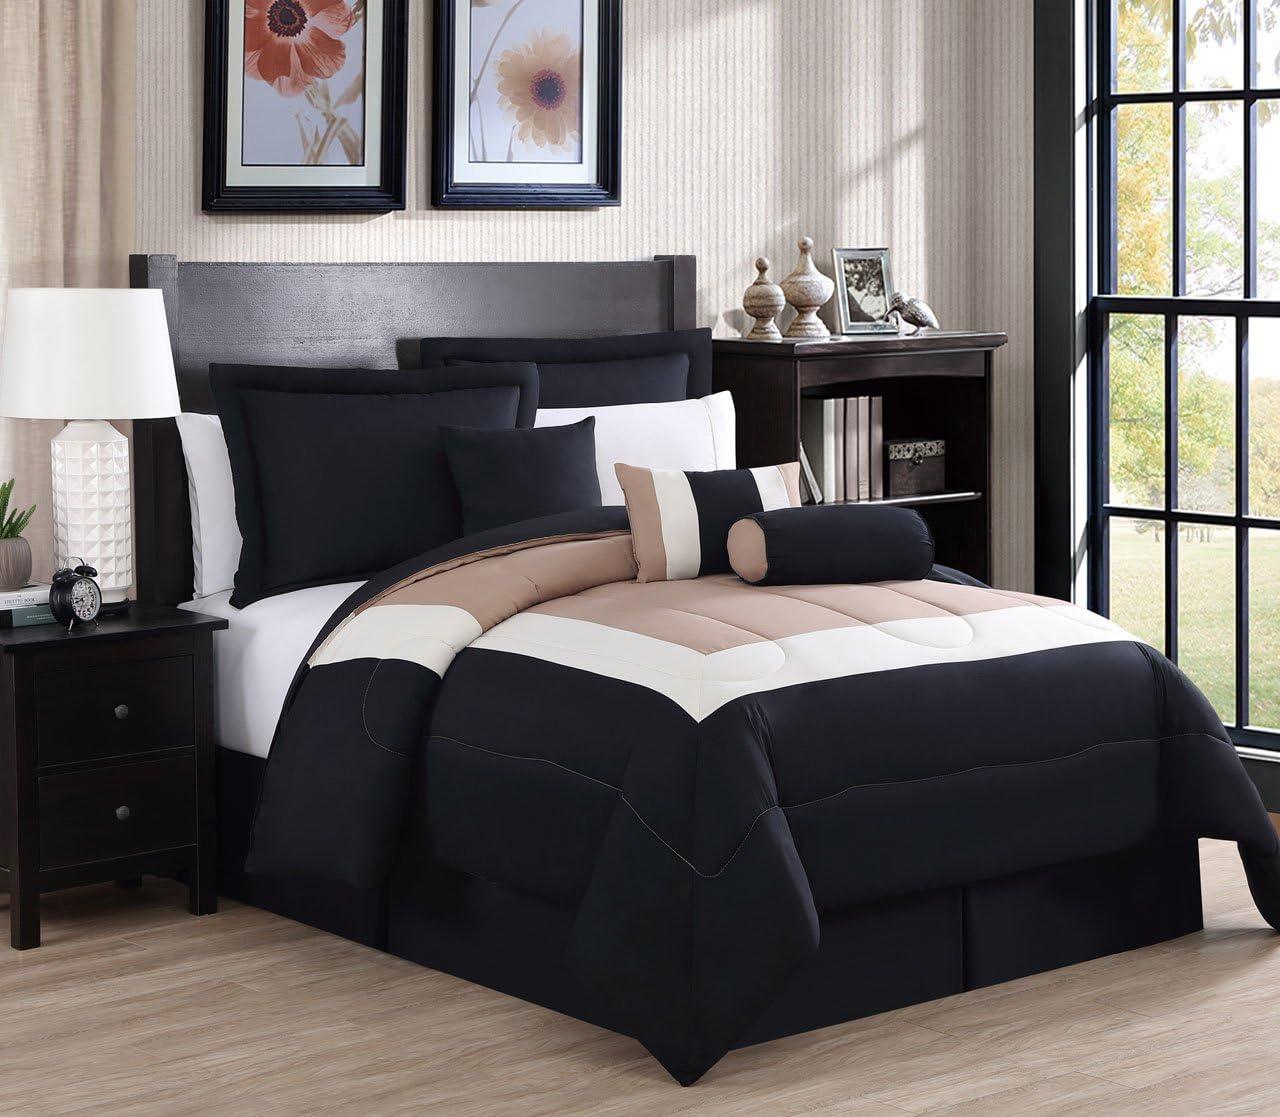 7 Piece King Rosslyn Black//Gray Comforter Set